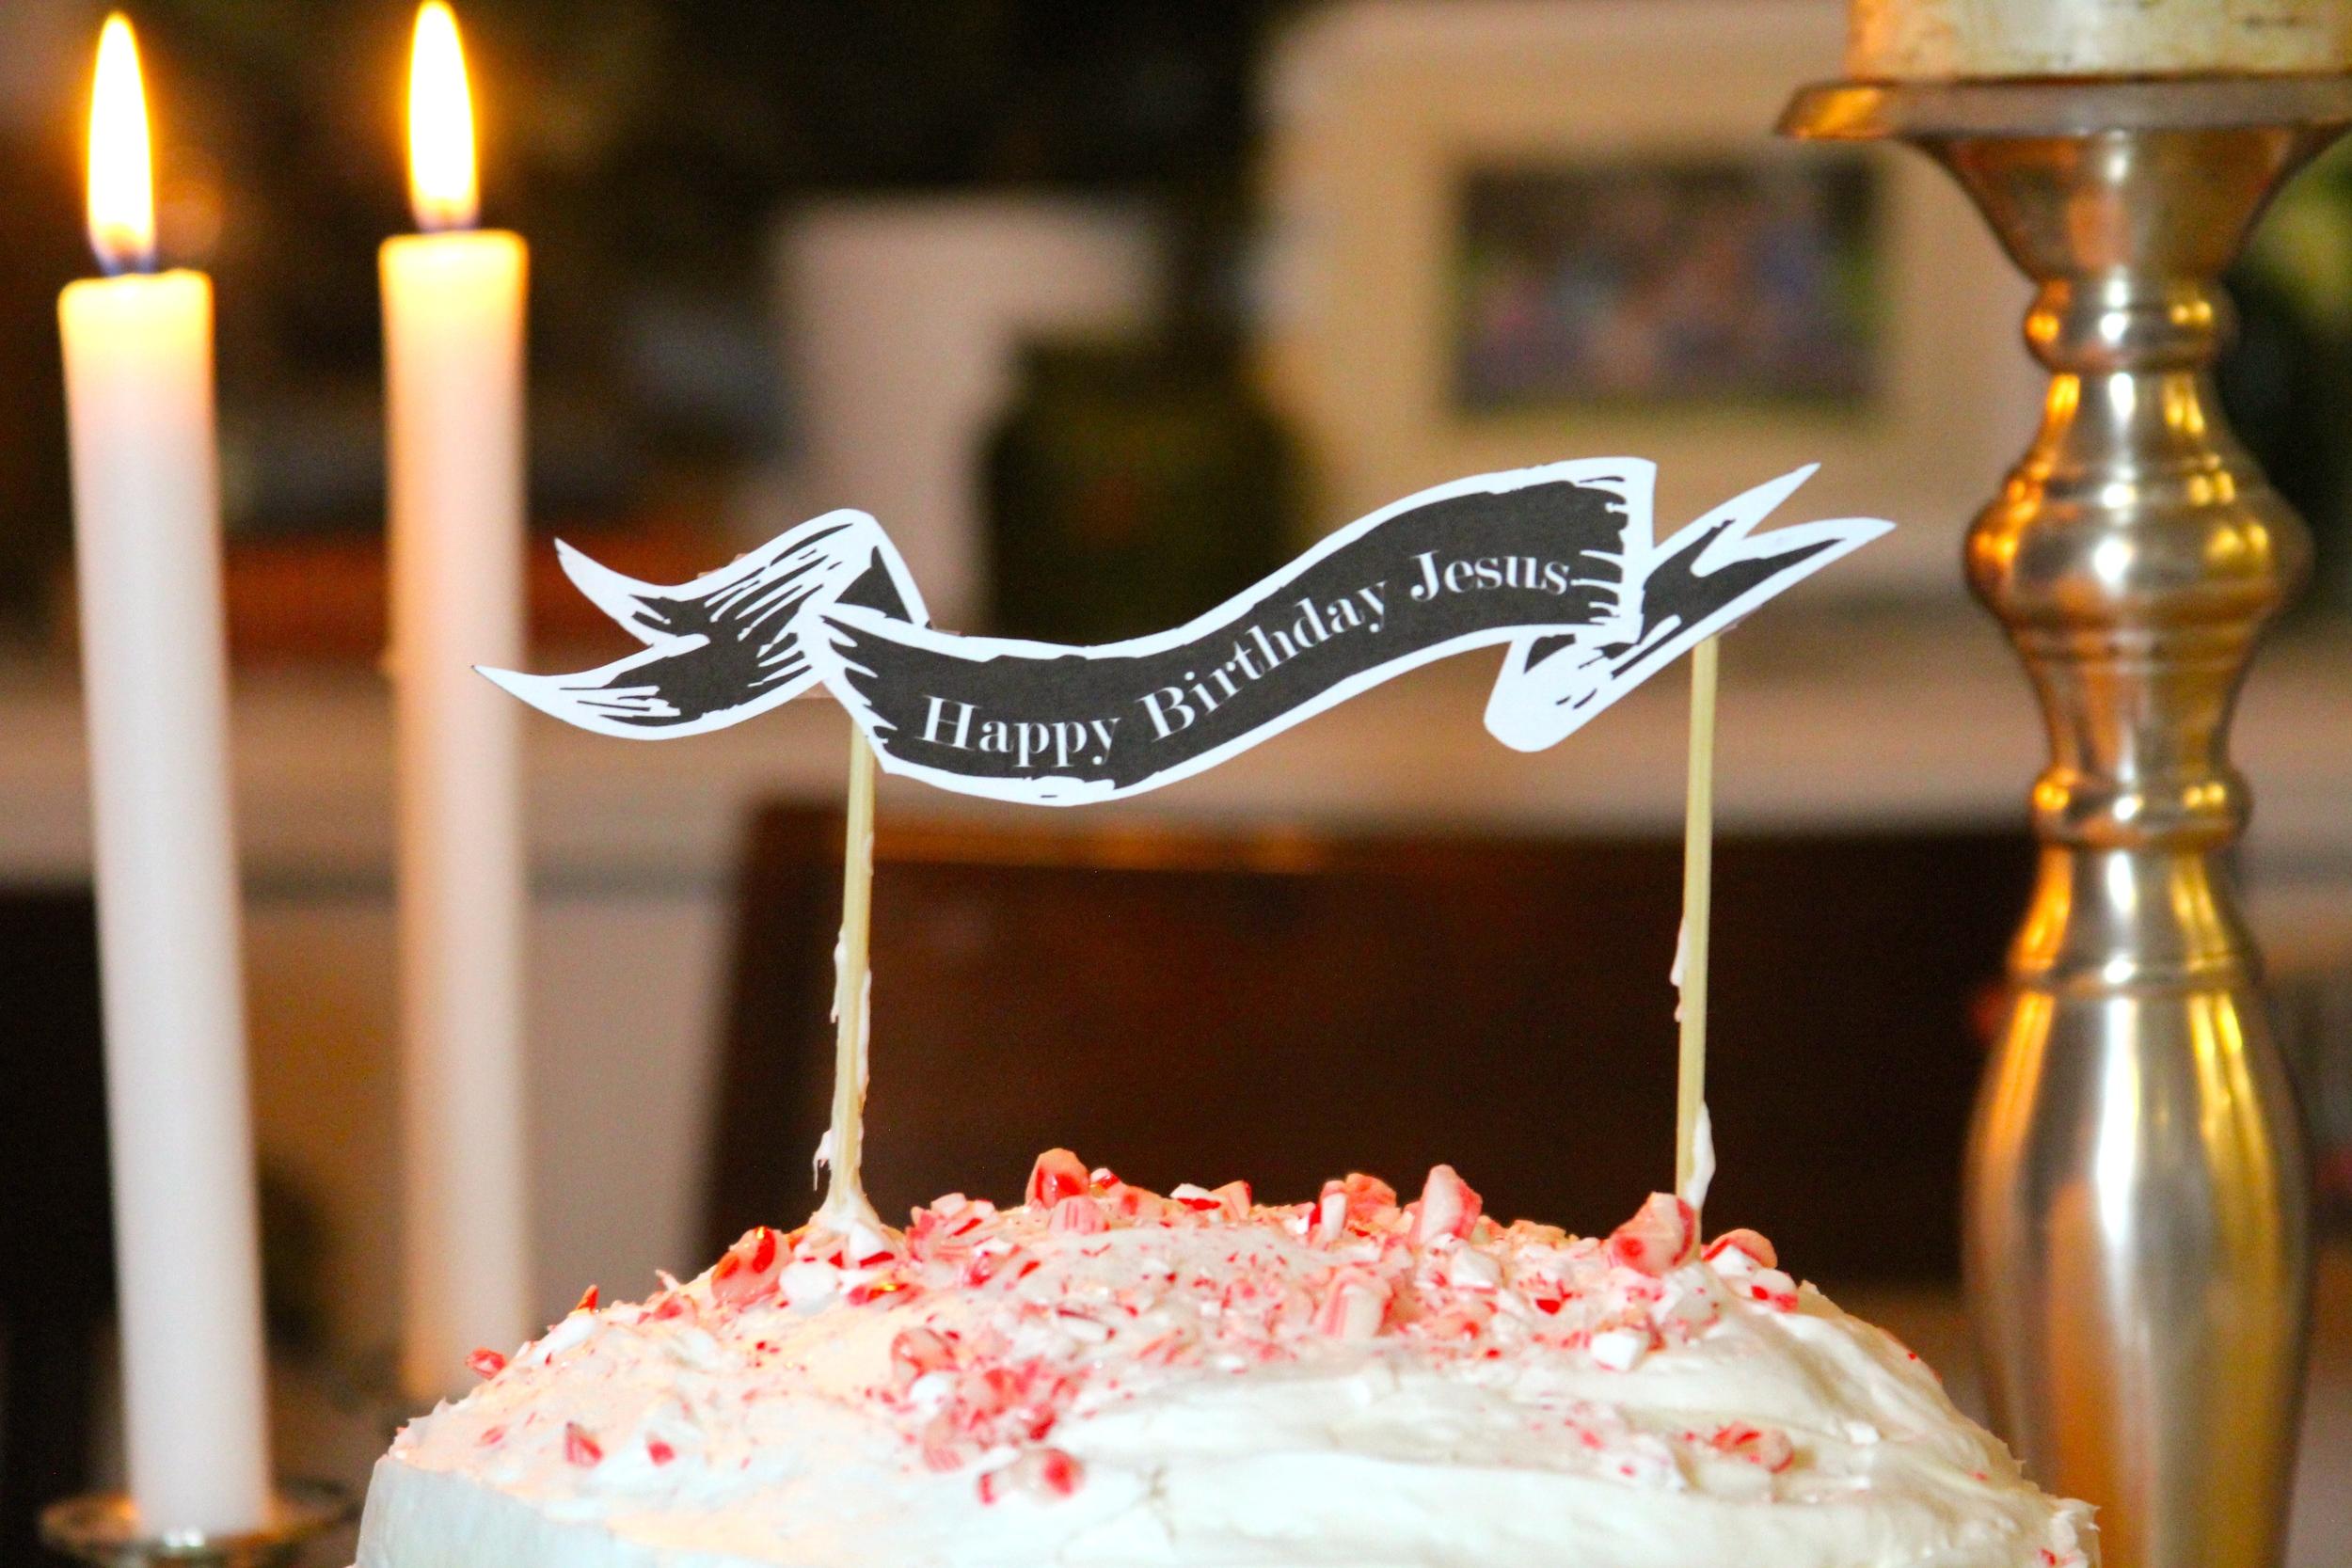 photo regarding Cake Banner Printable known as joyful birthday, Jesus! + printable cake banners teresa